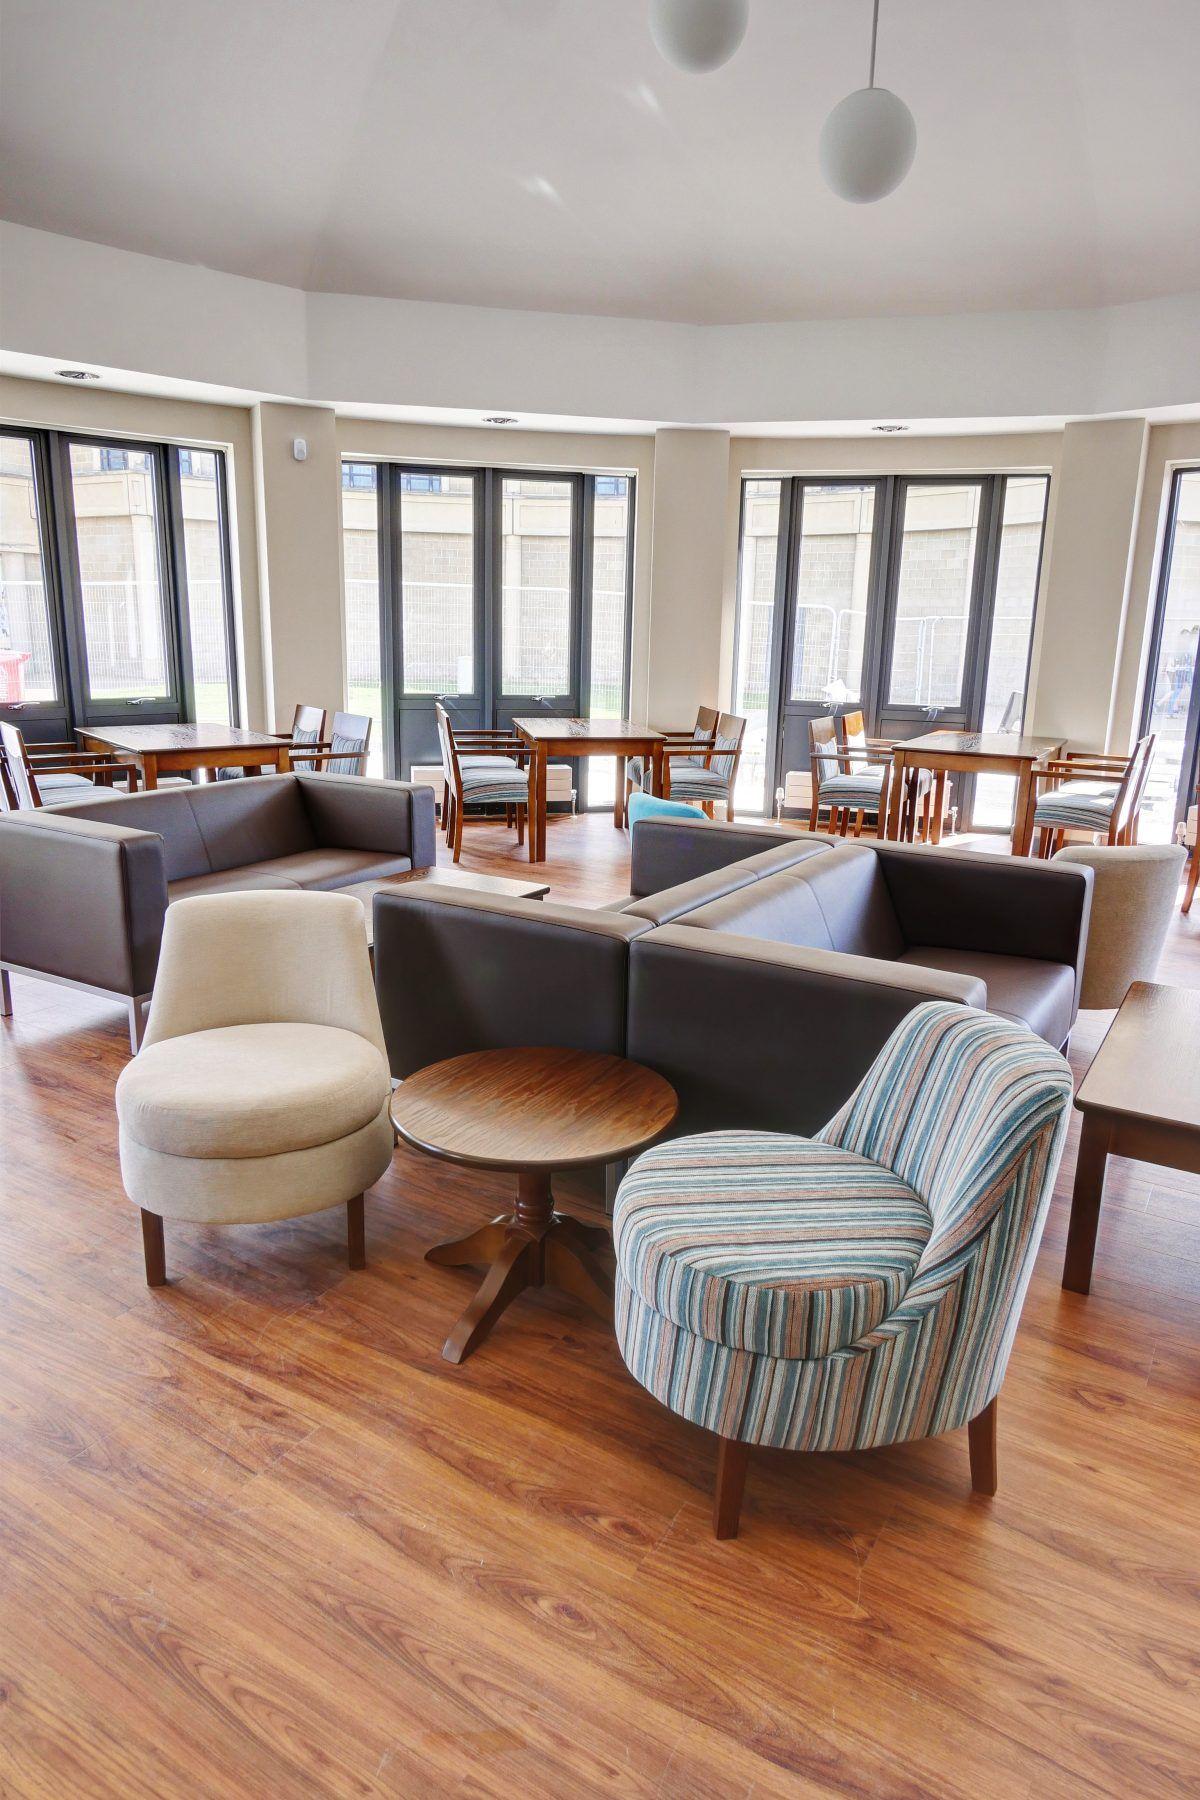 Weston College 2017 Furniture, Cafe furniture, White